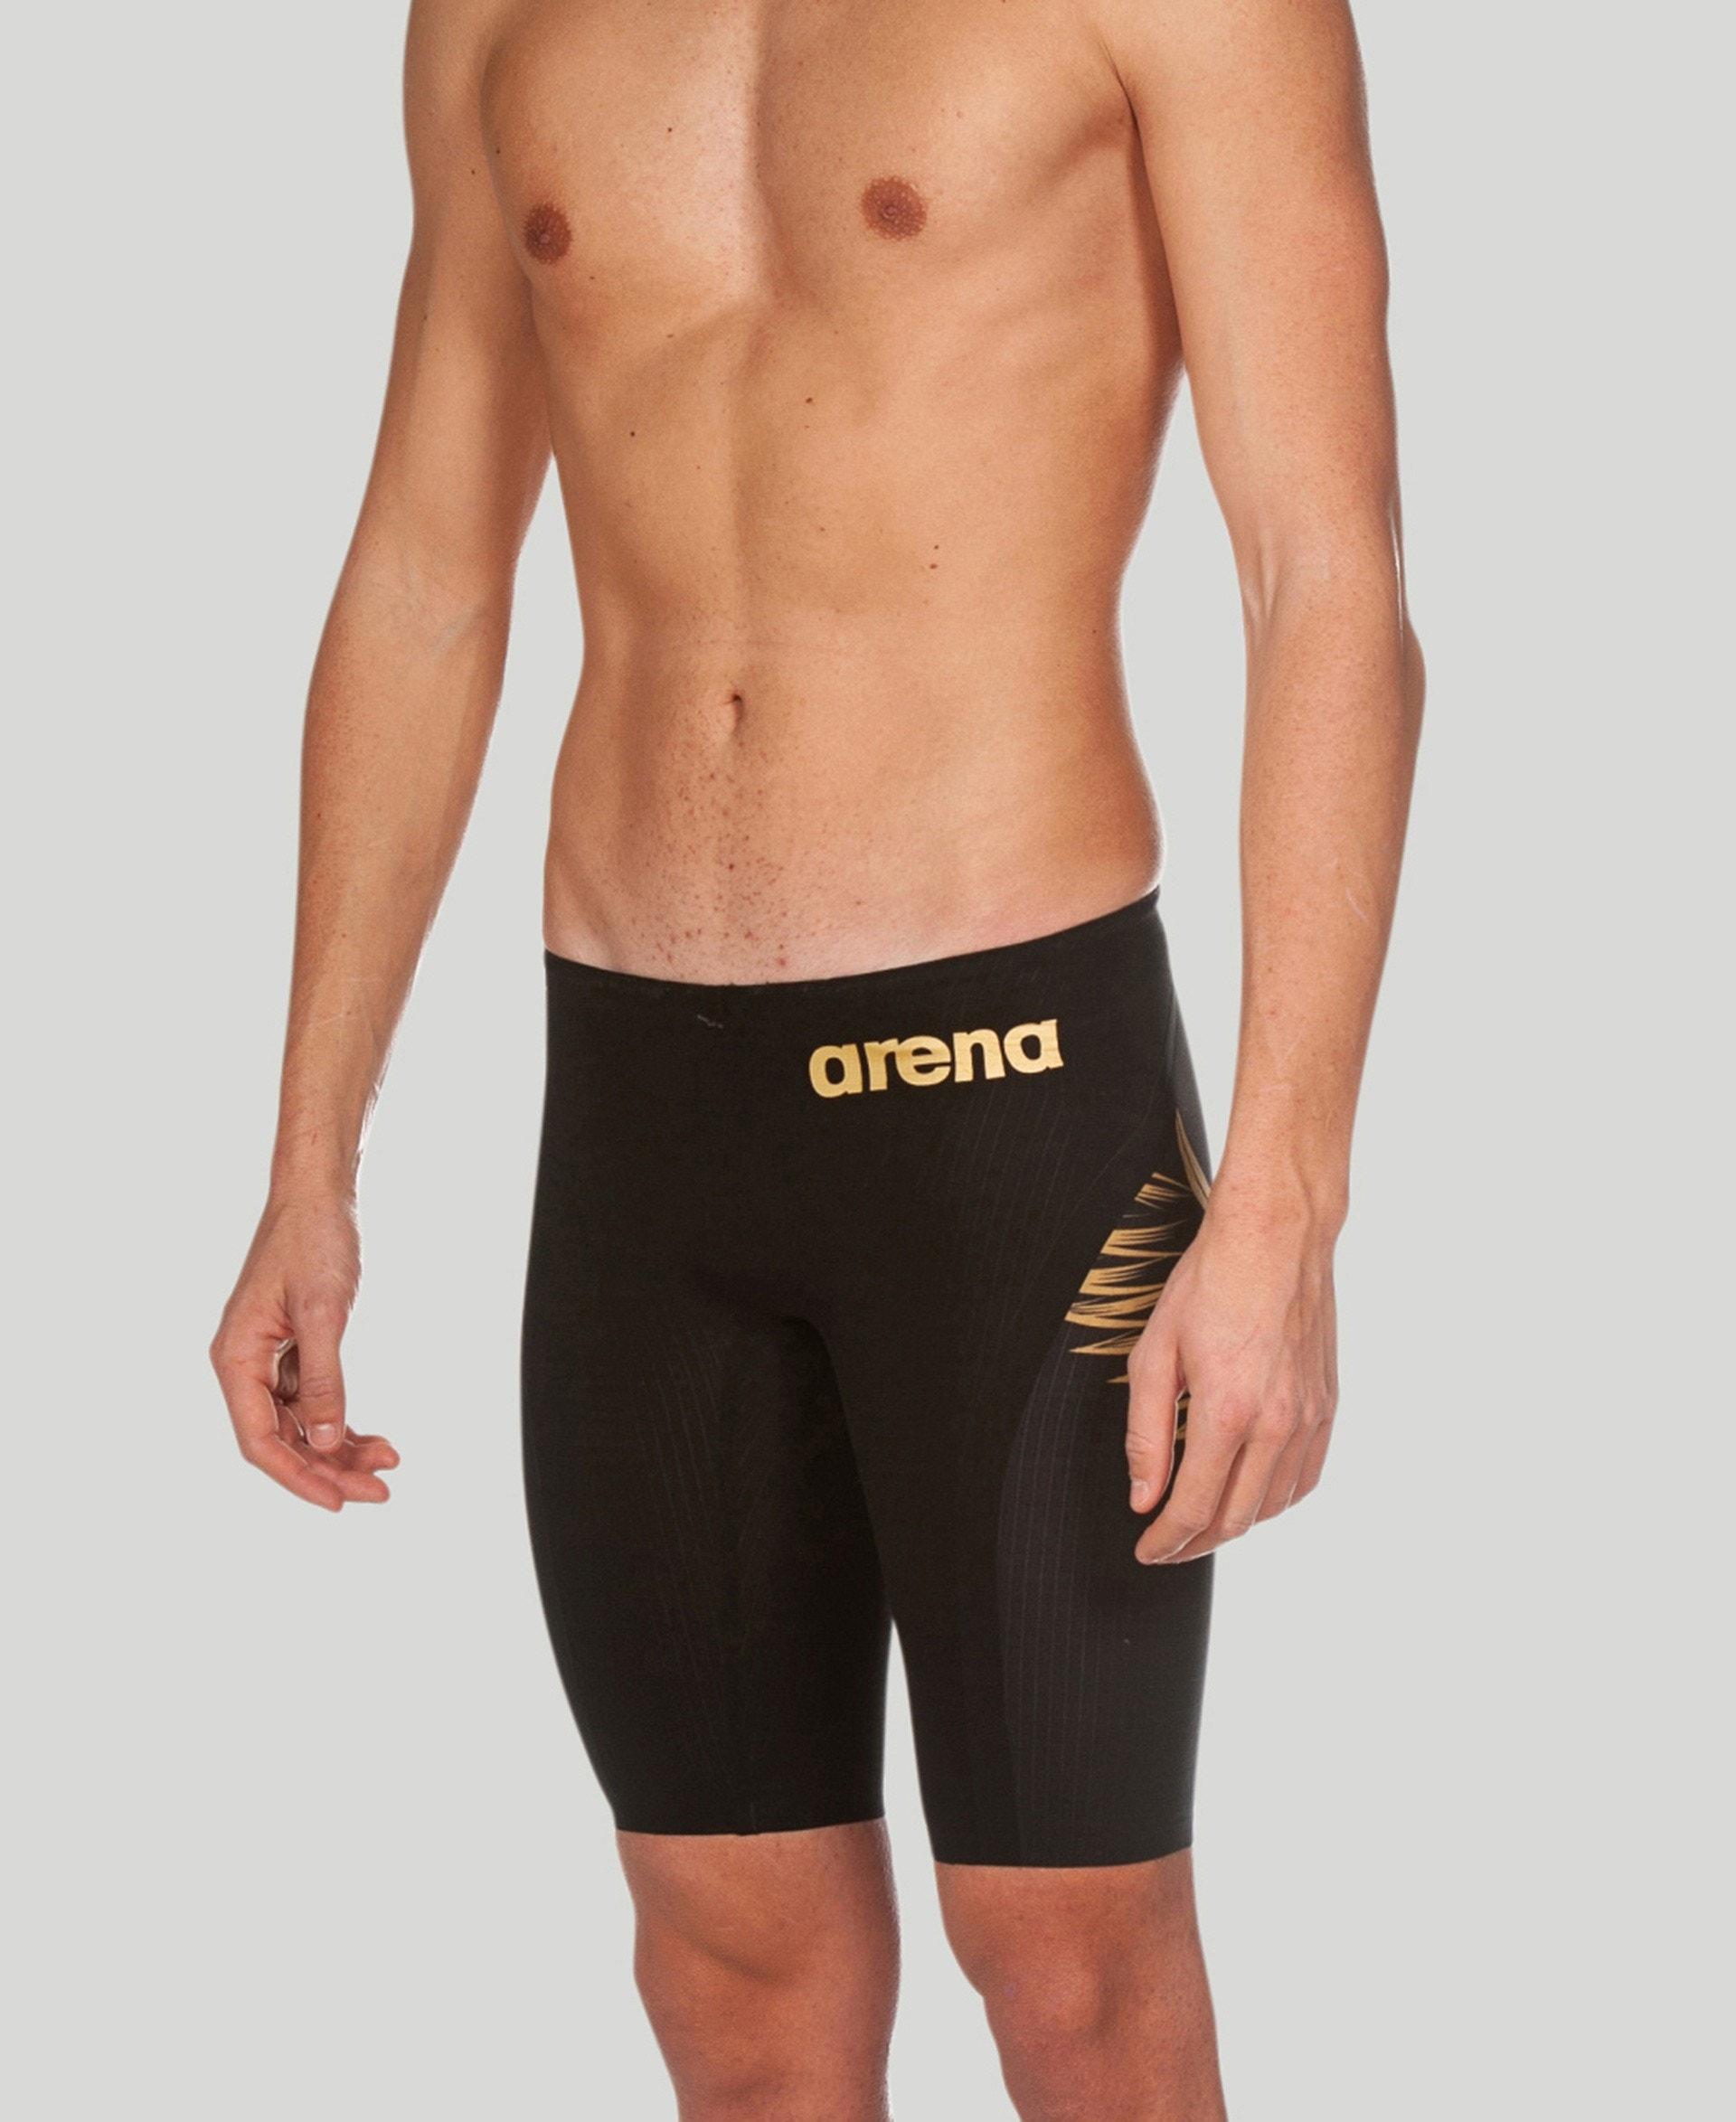 Arena Mens Water MaxLife Panel Jammer Swimsuit